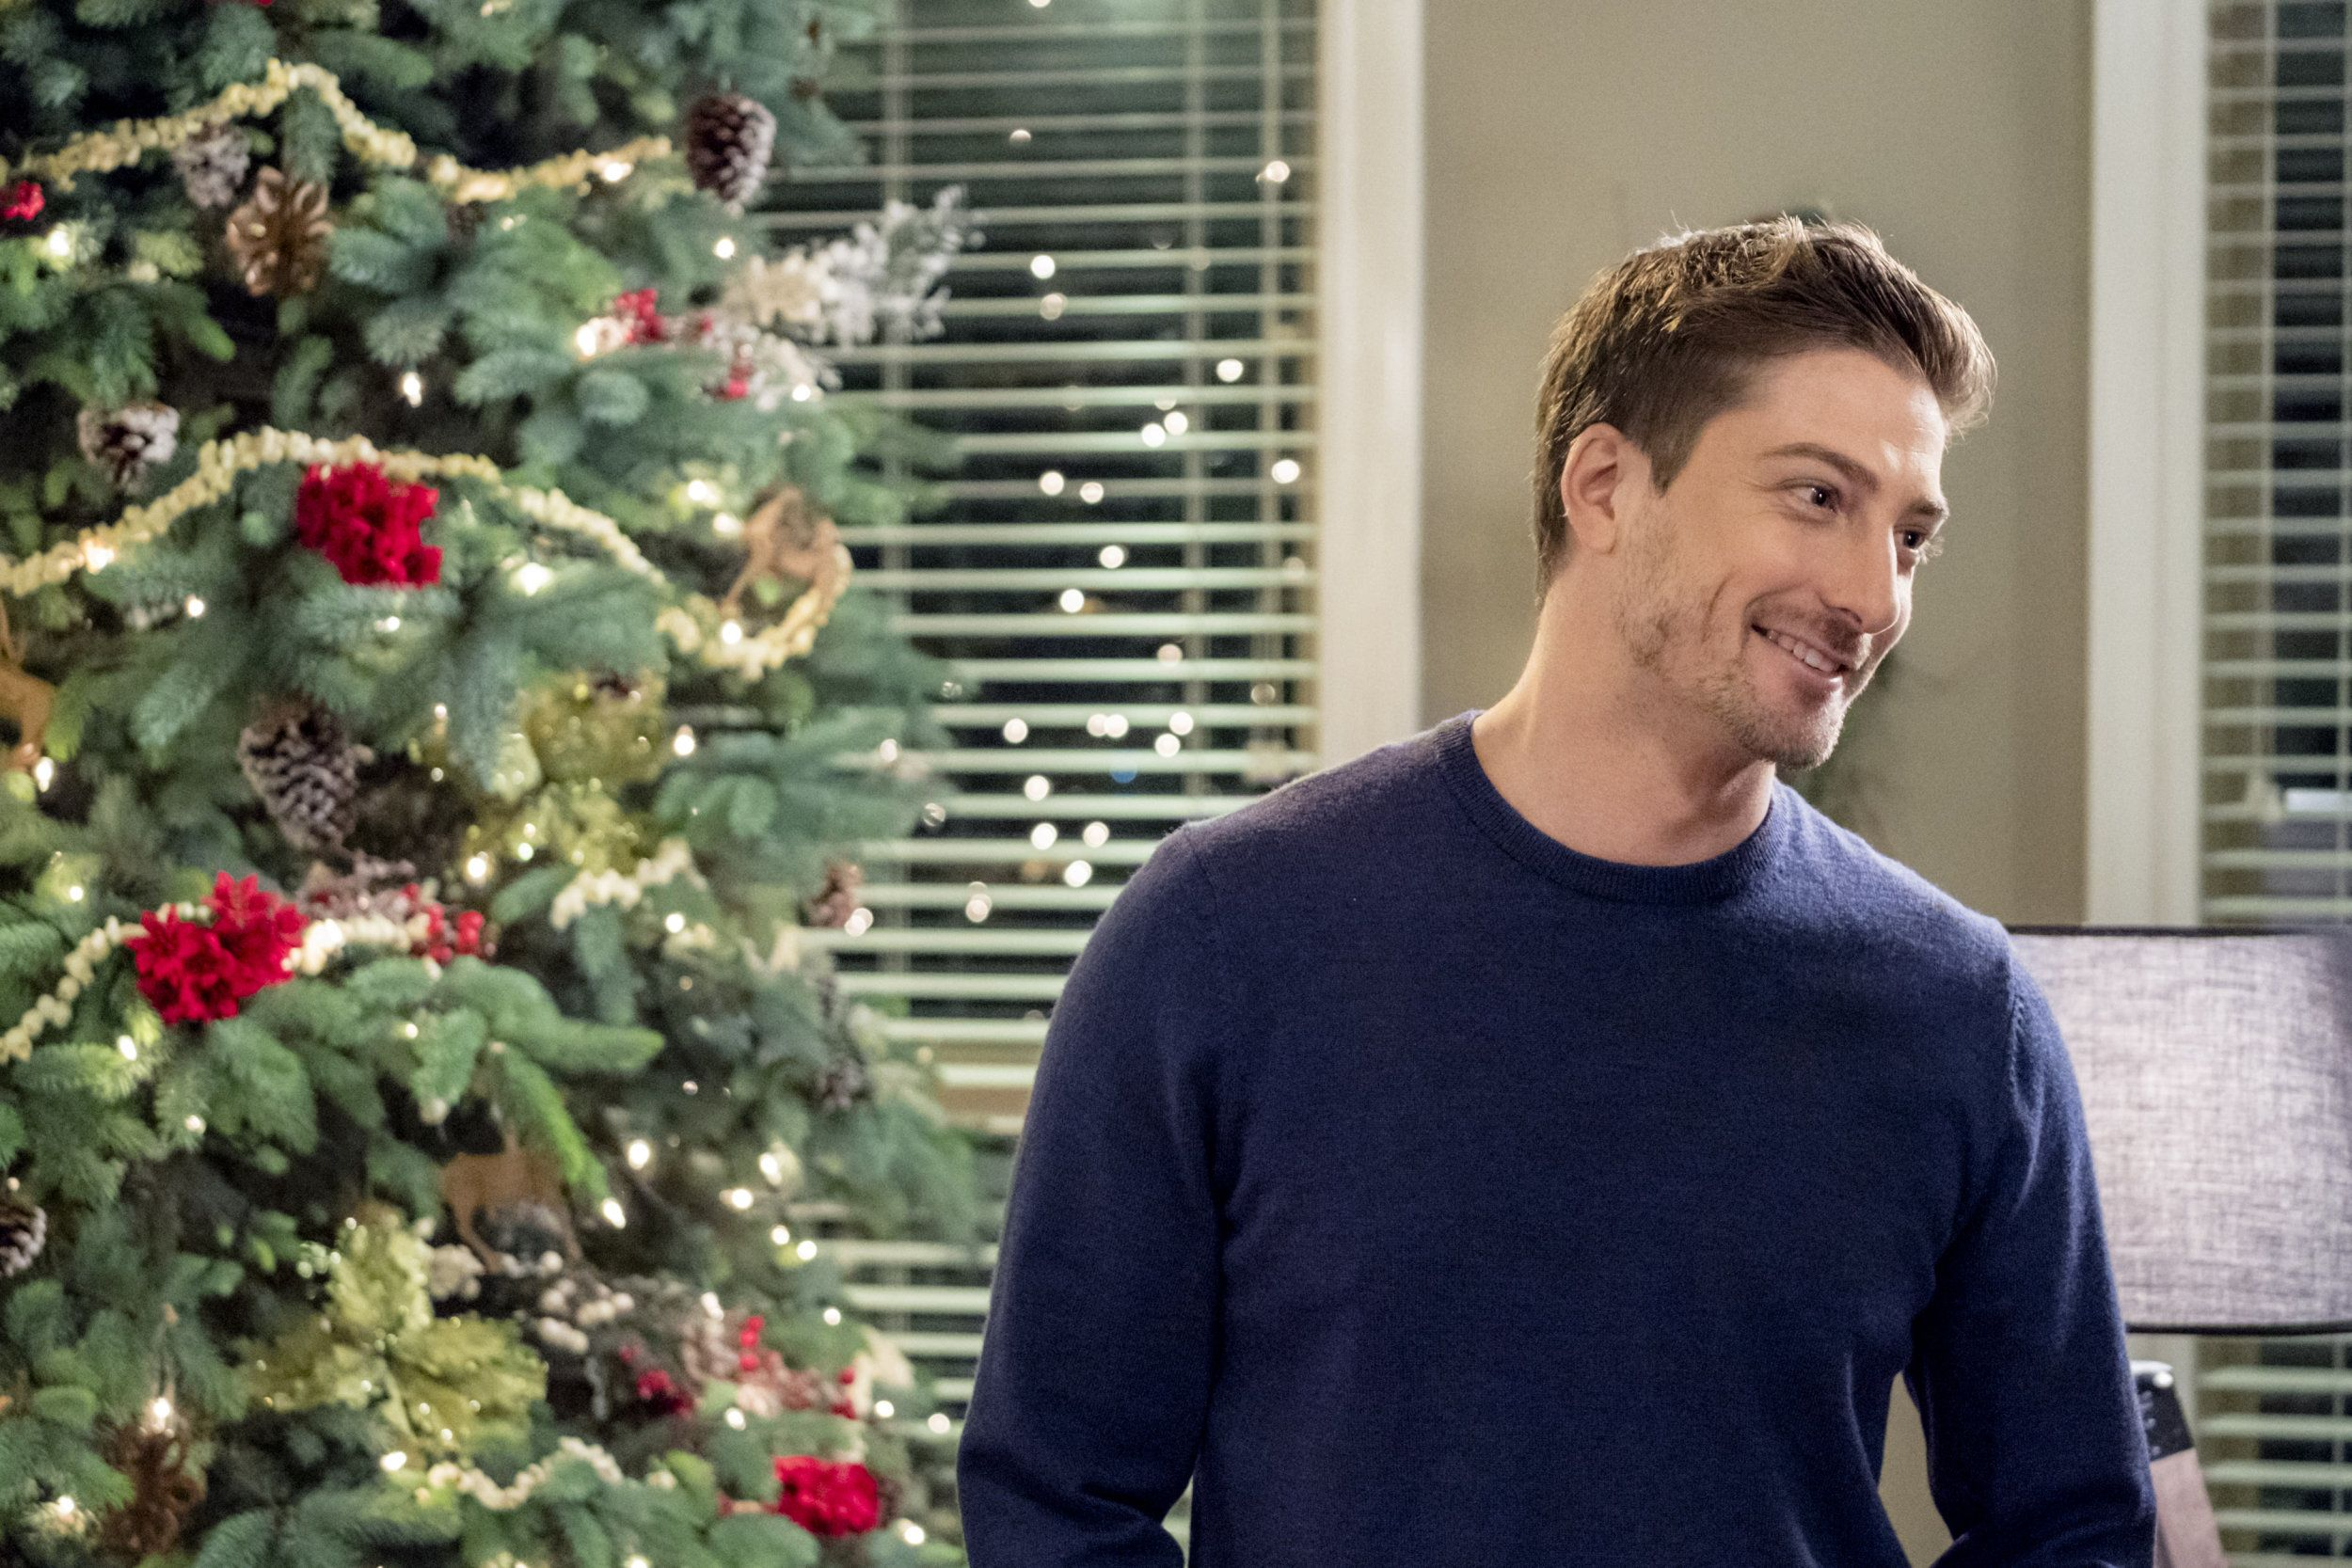 Watch new romance movies, comedies, Christmas movies, favorite ...